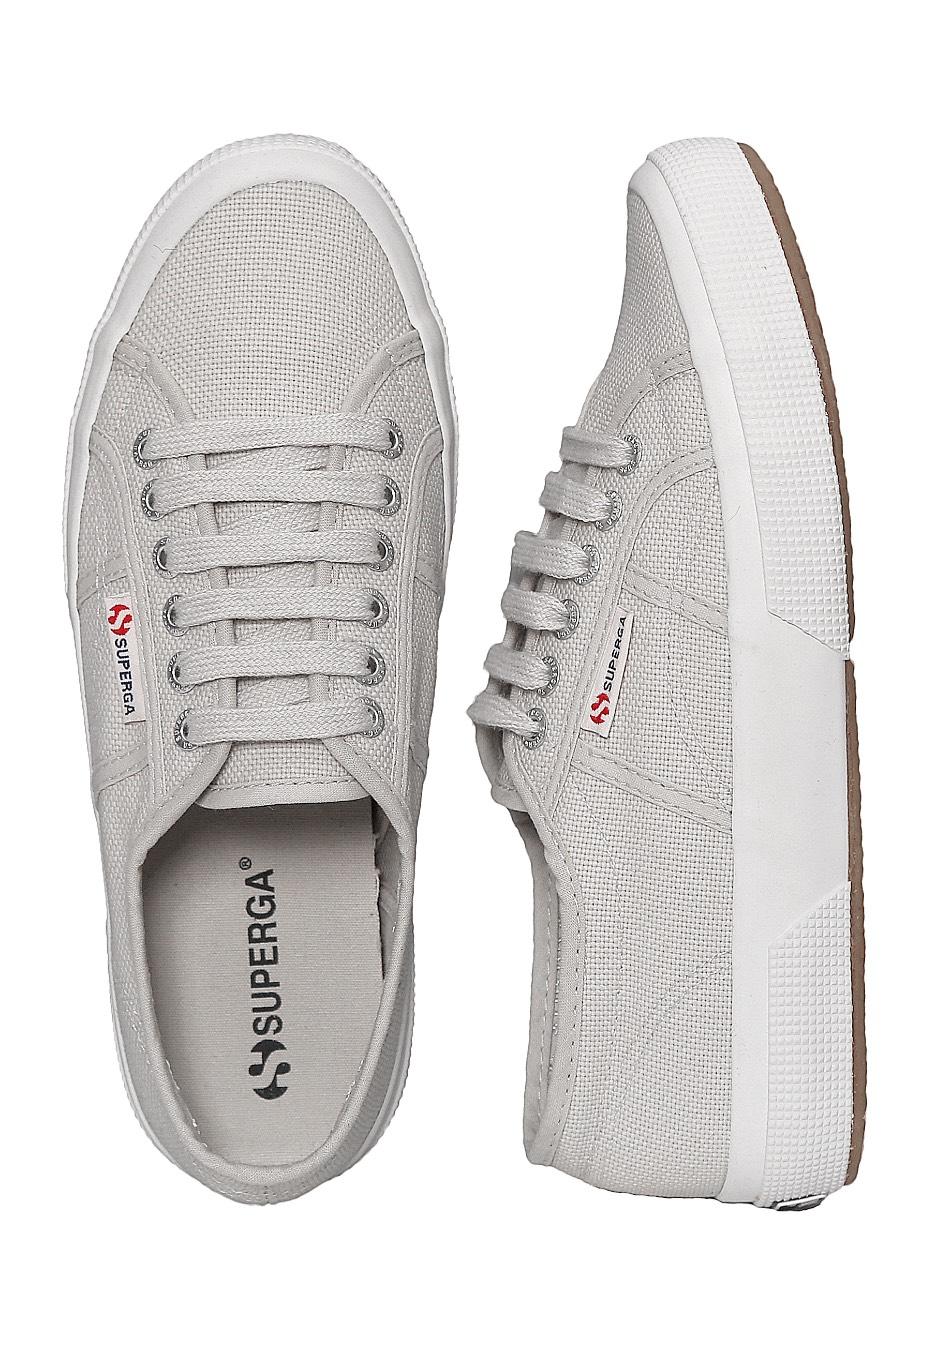 Superga - 2750 Cotu Classic Grey Vapor - Girl Shoes